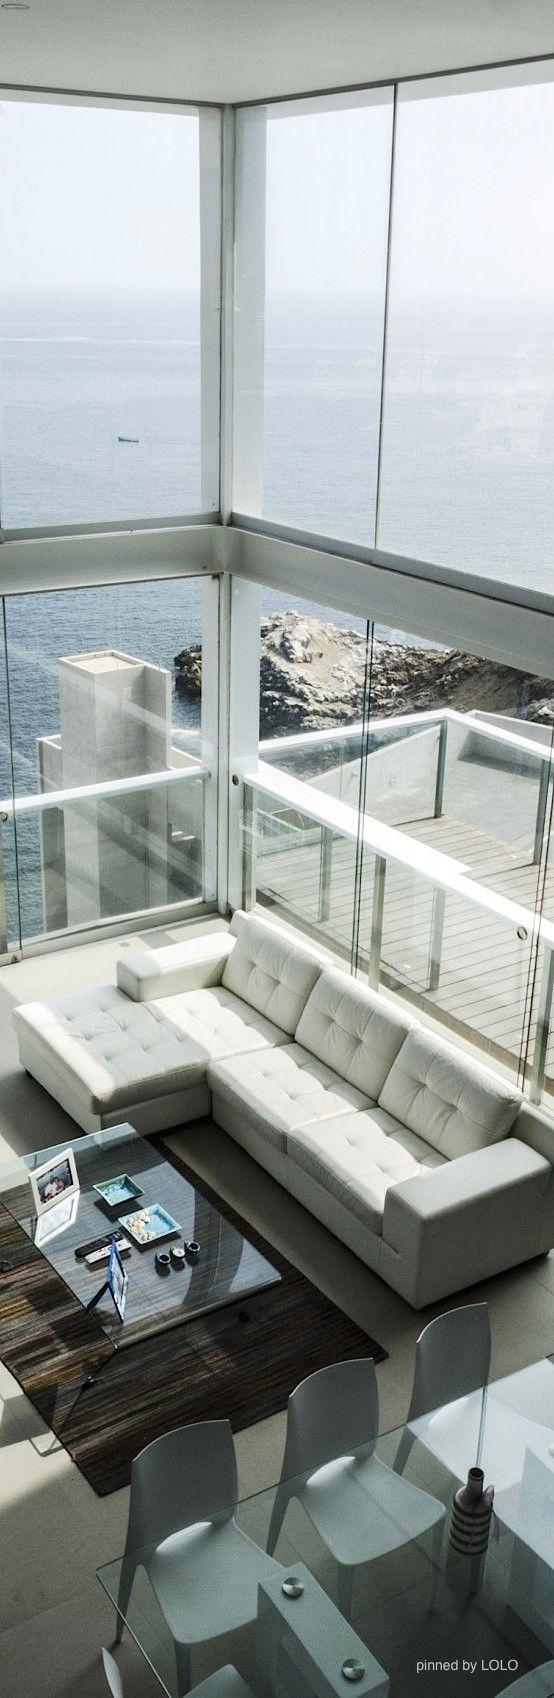 A beautiful, modern beach house IS my dream house!